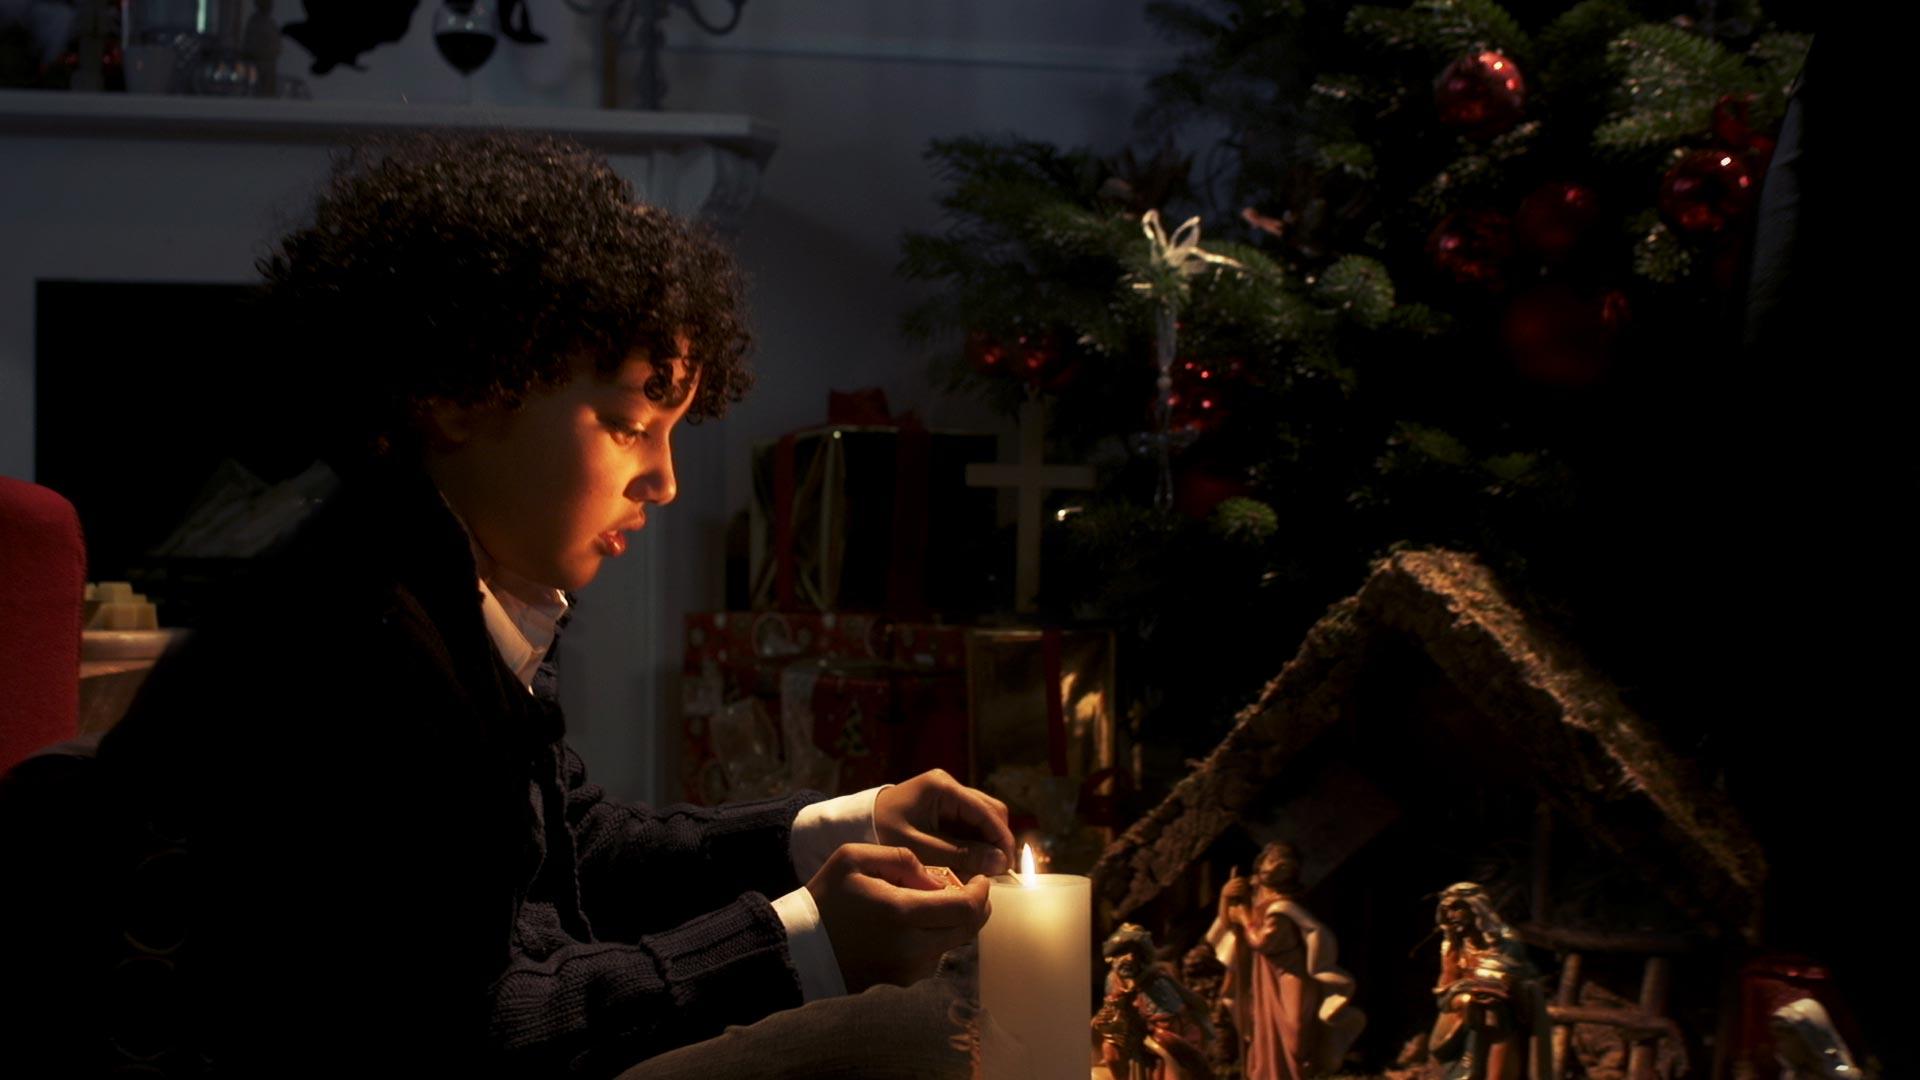 EO_Kerst-brengt-Licht-12sec-HD-00050